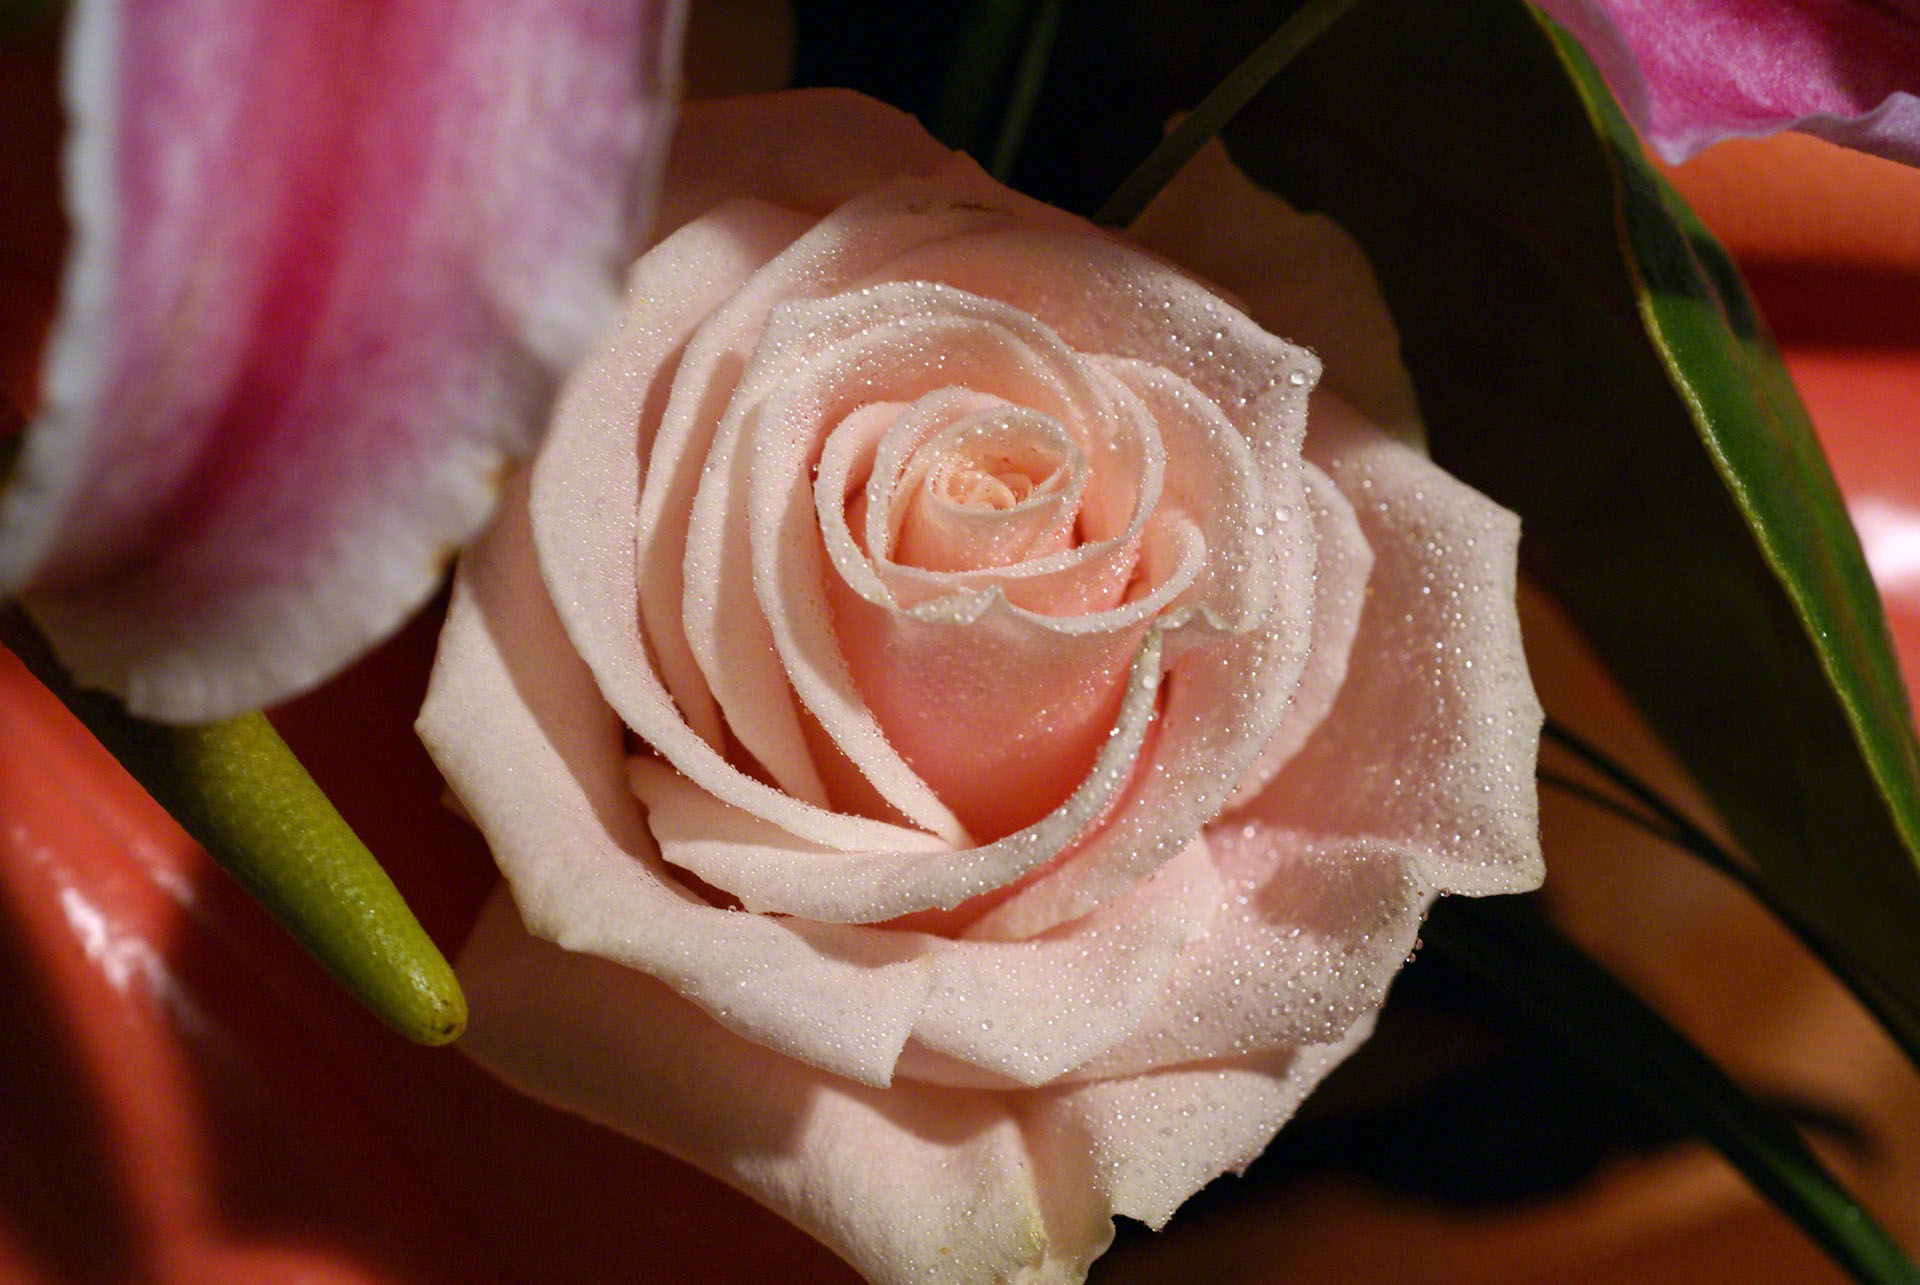 http://www.fabiovisentin.com/photography/photo/12/peach-rose-macro-dsc01197.jpg